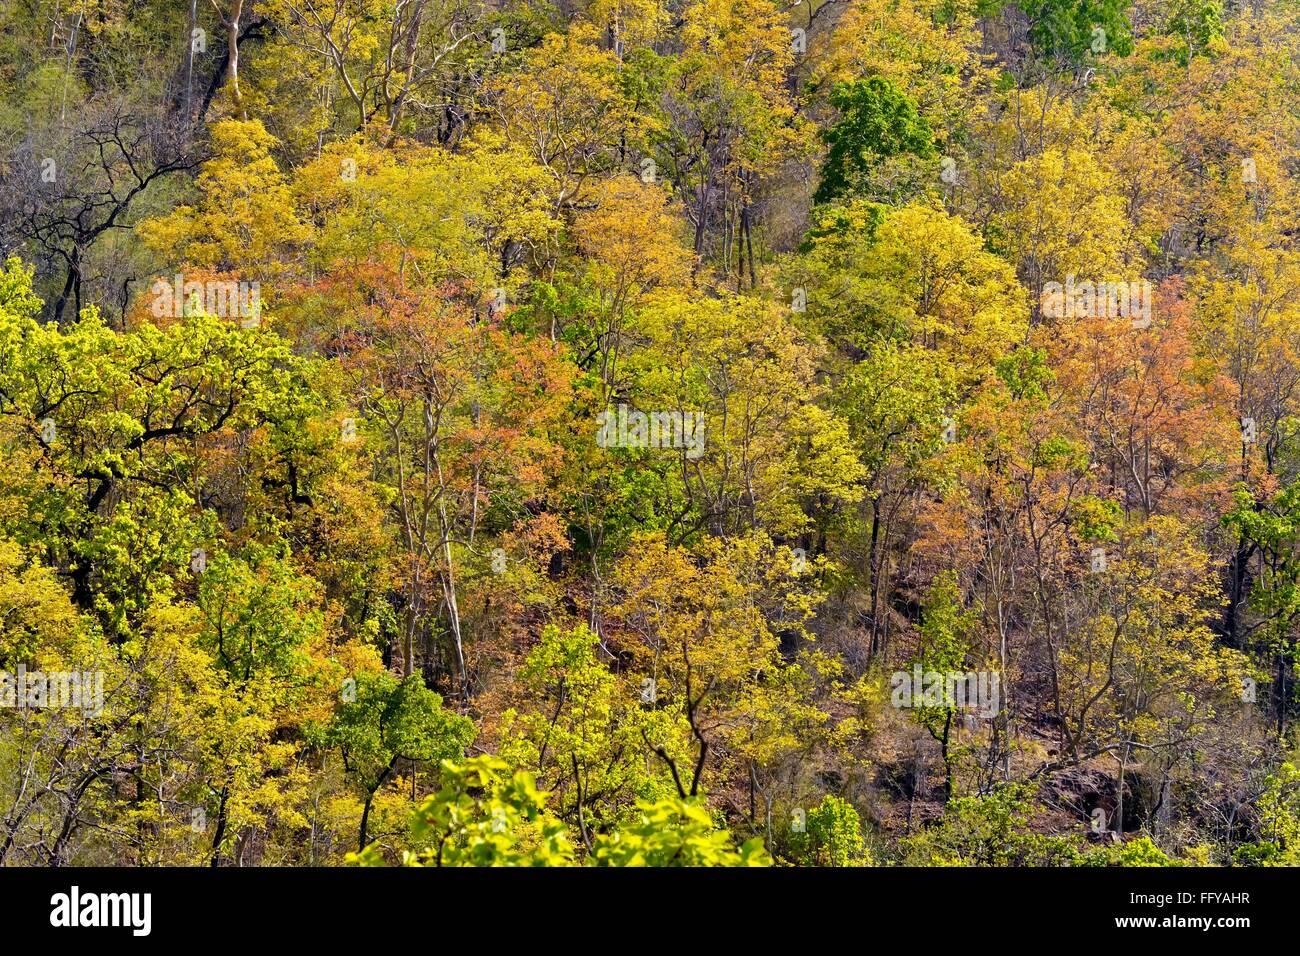 Forests of bandhavgarh national park madhya pradesh India - Stock Image